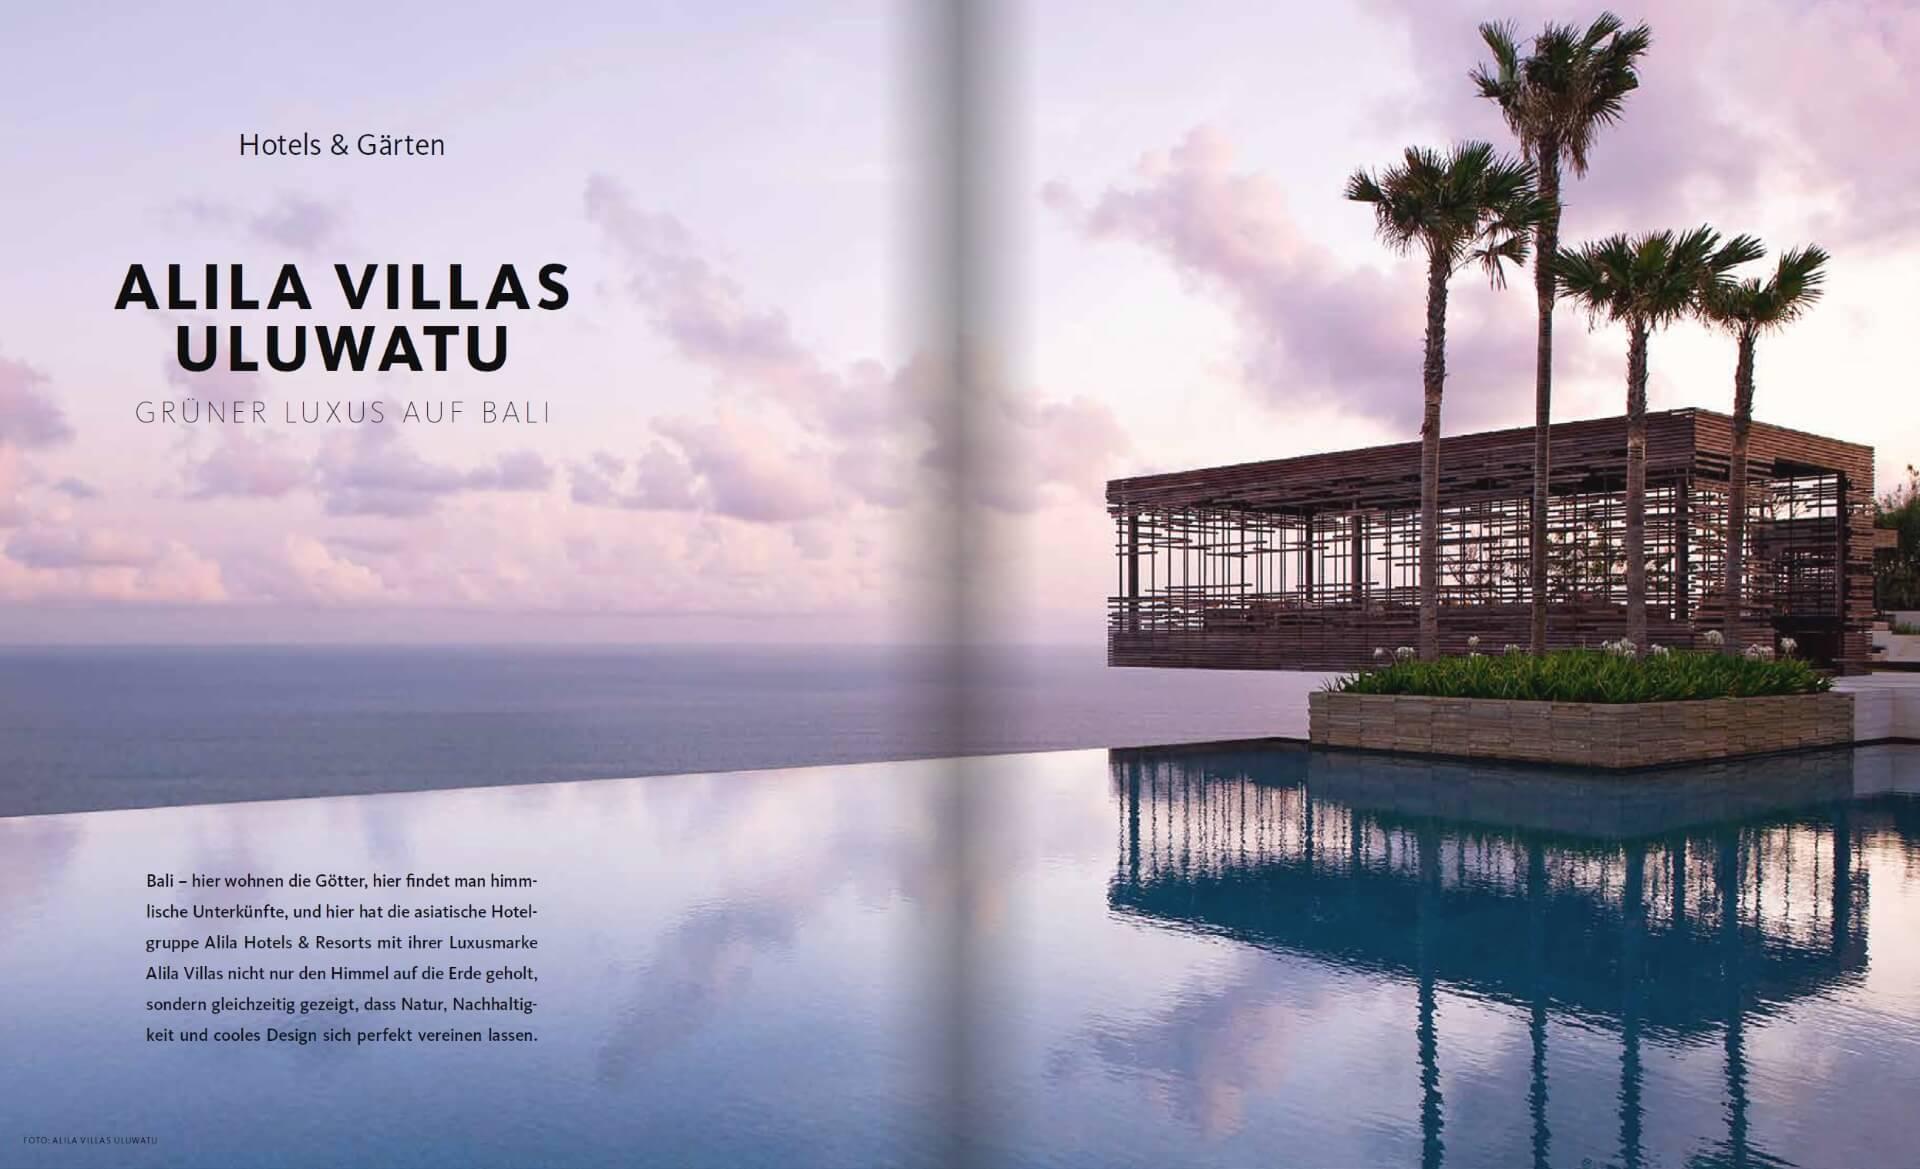 GARTENDESIGN INSPIRATION 4/2017: Alila Villas Uluwatu Bali